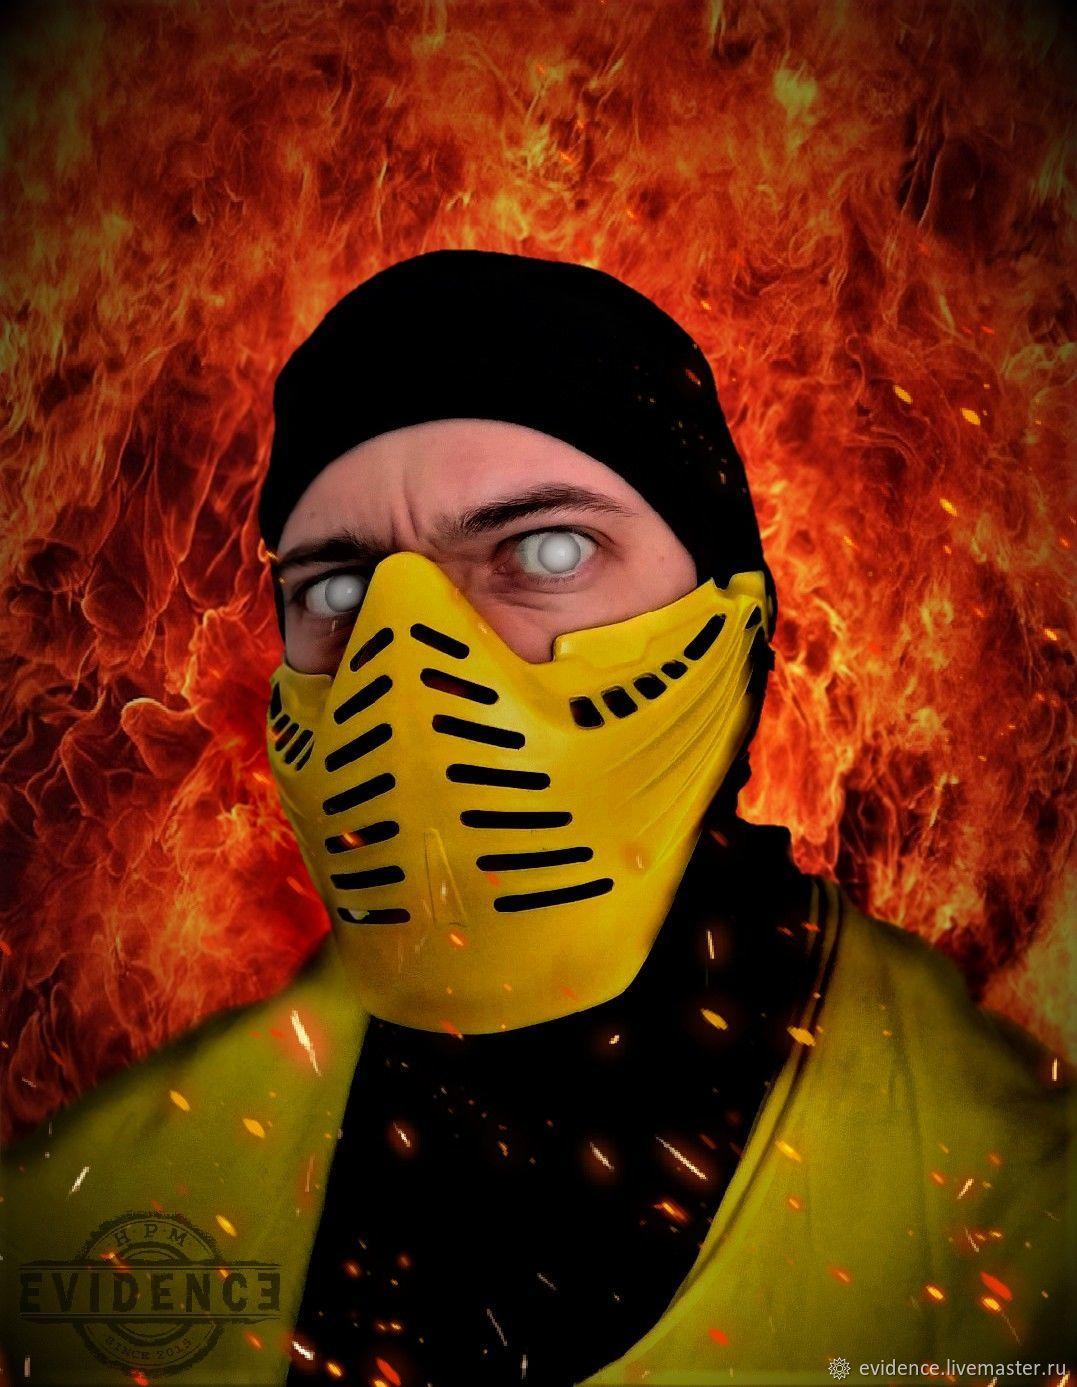 Картинки скорпиона из мортал комбат маска